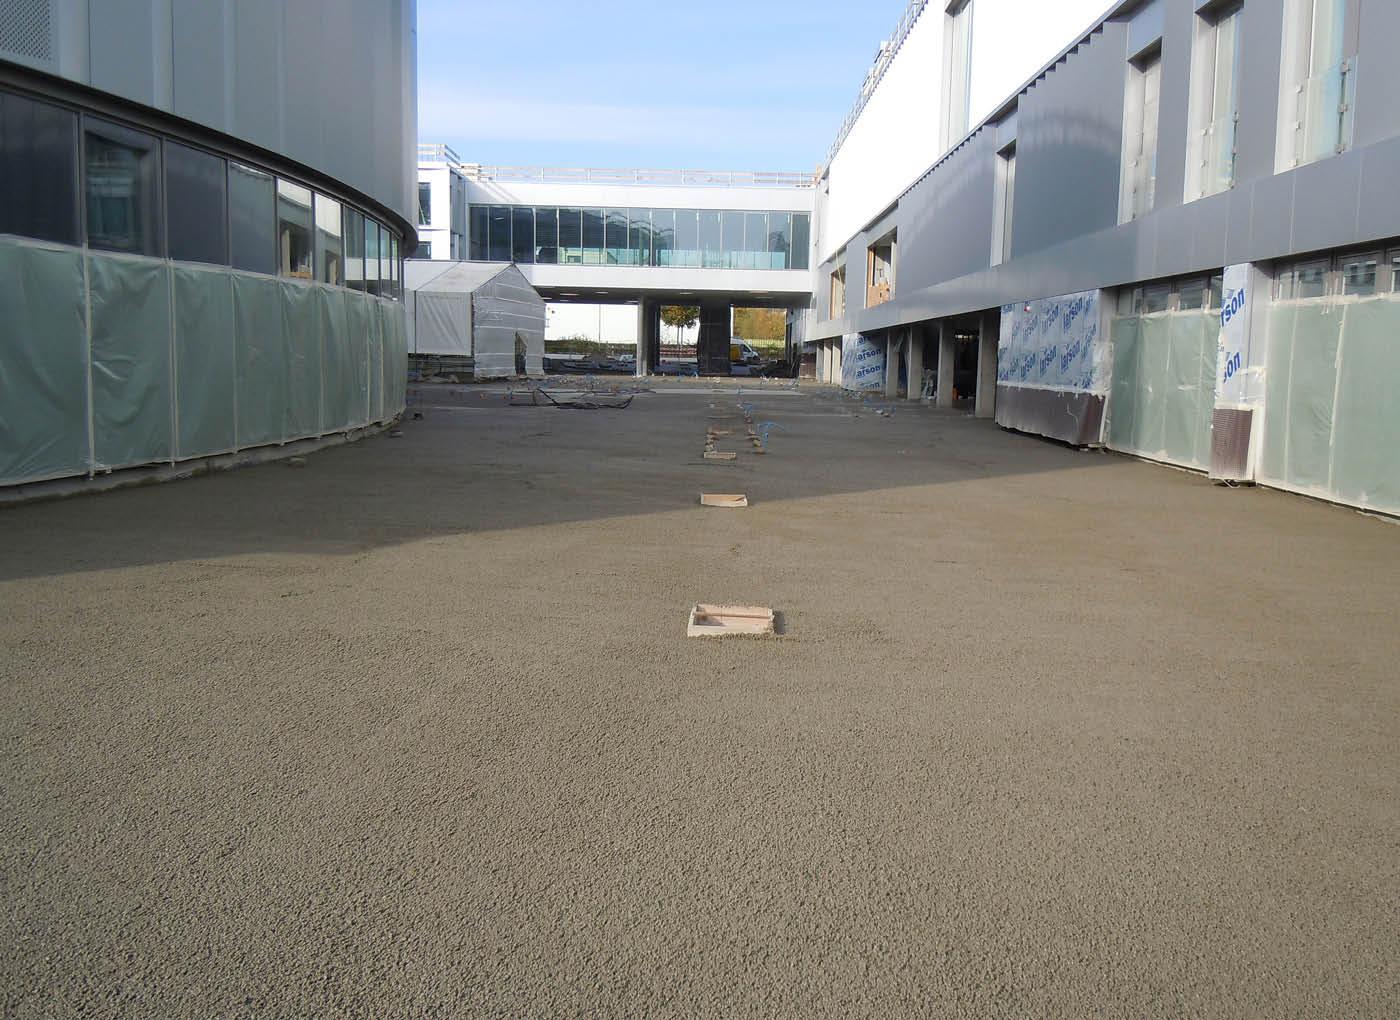 Centro commerciale iLife, Etoy, Svizzera